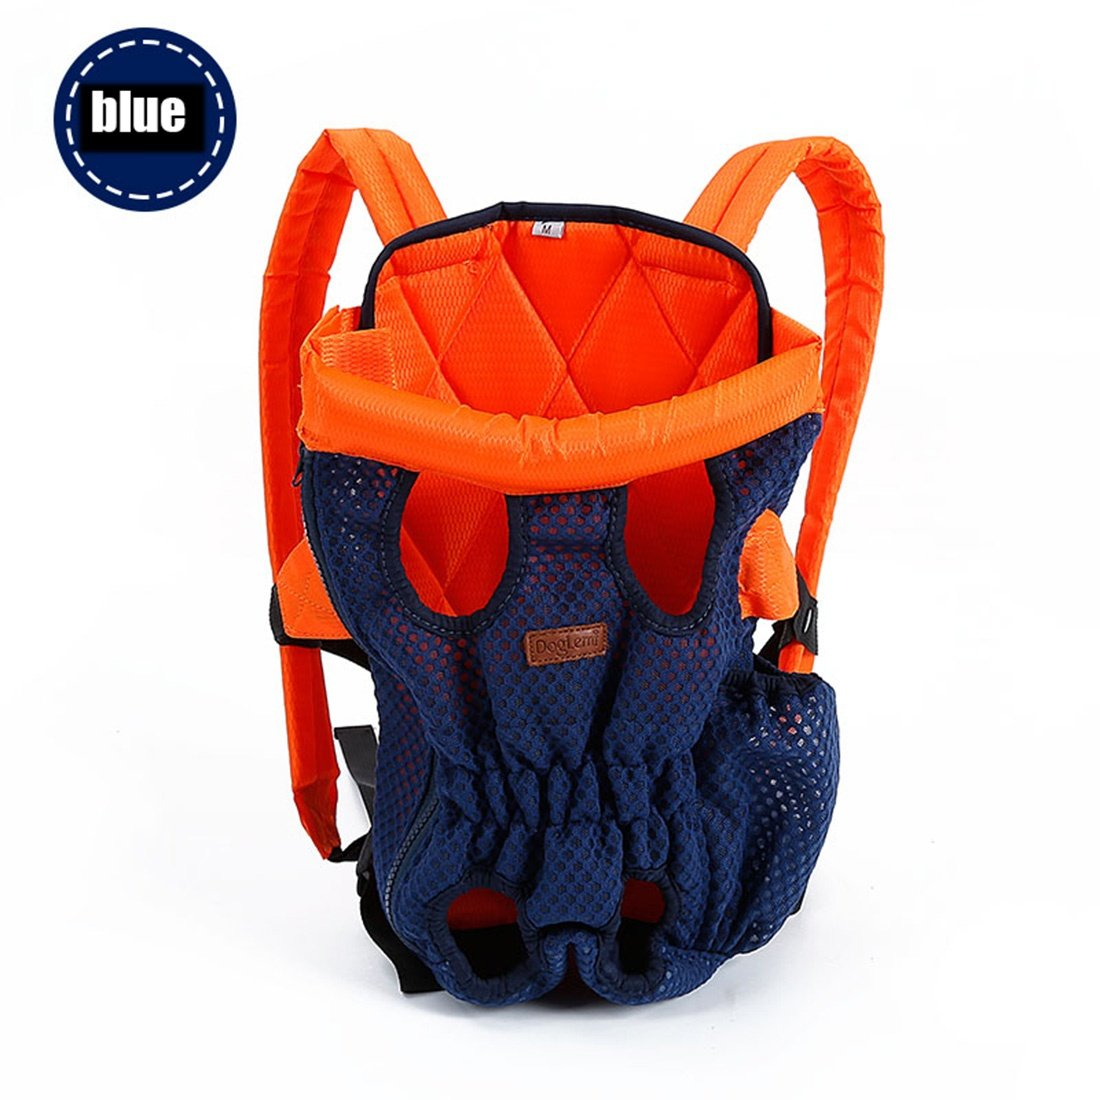 bluee MPet Backpack Carrier,Front Pet Dog Carrier Front Chest Backpack Pet Cat Puppy Tote Holder Bag Sling Outdoor, Black, L